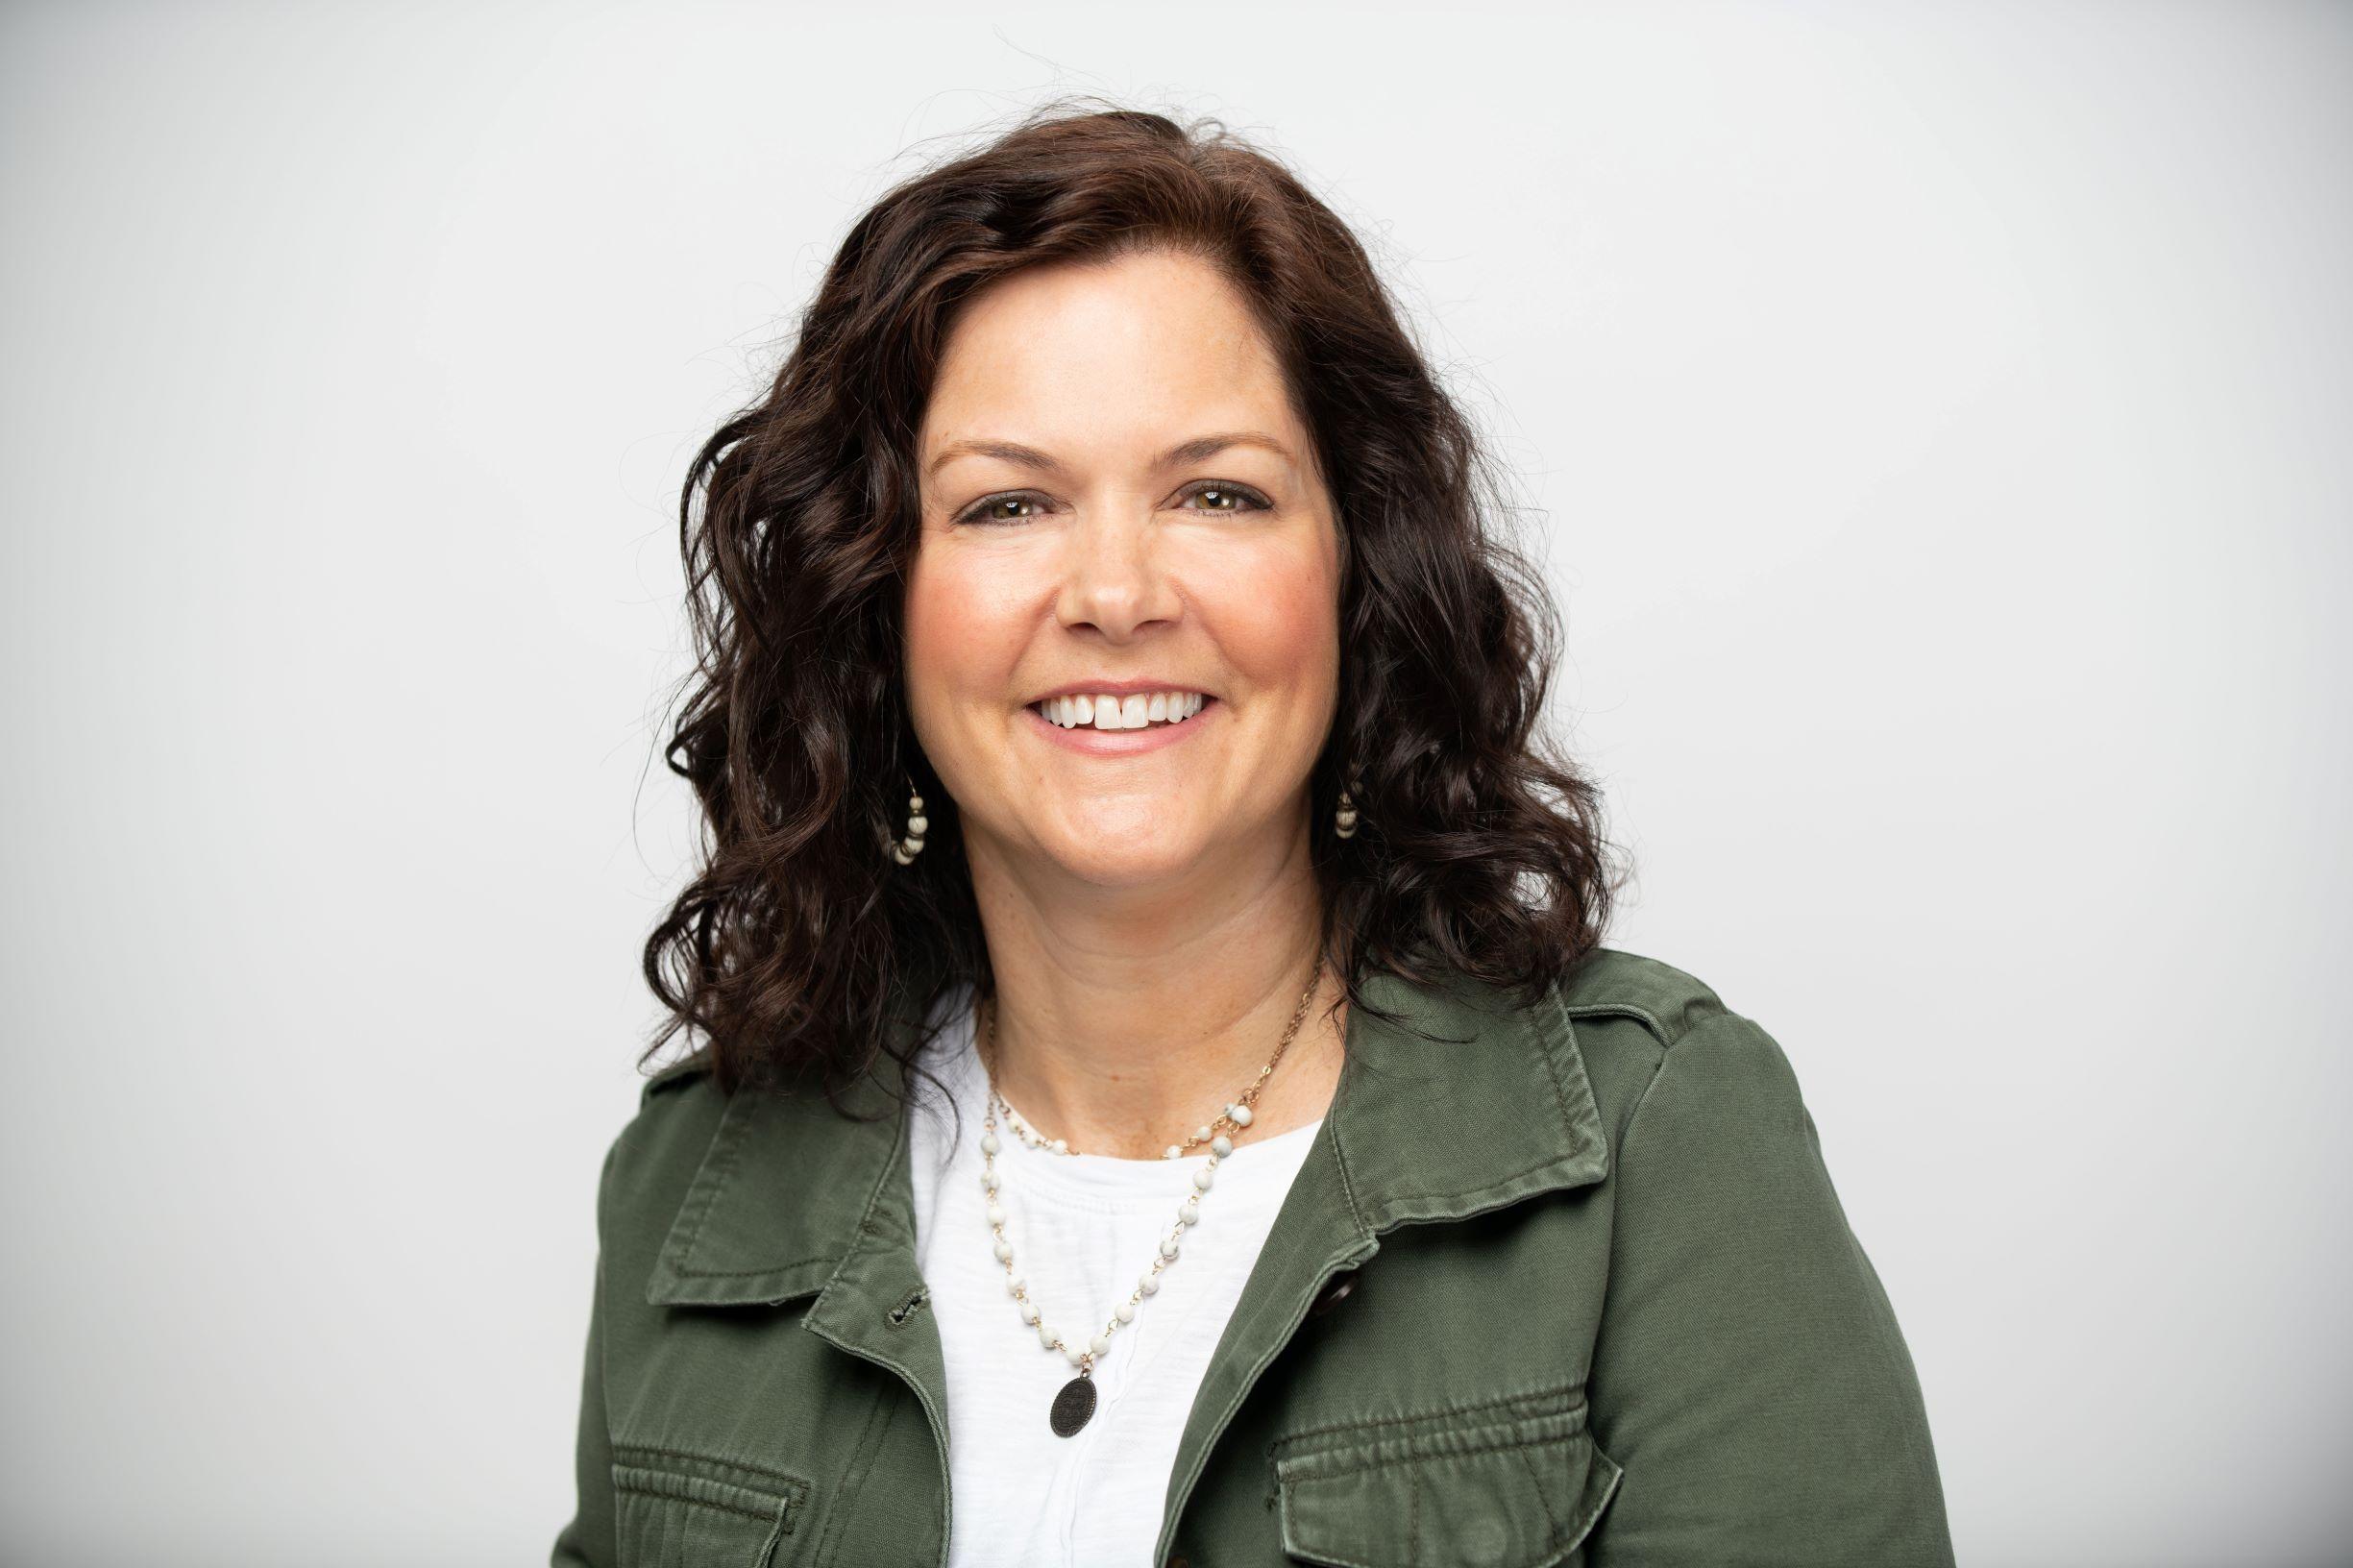 Kristin Mock